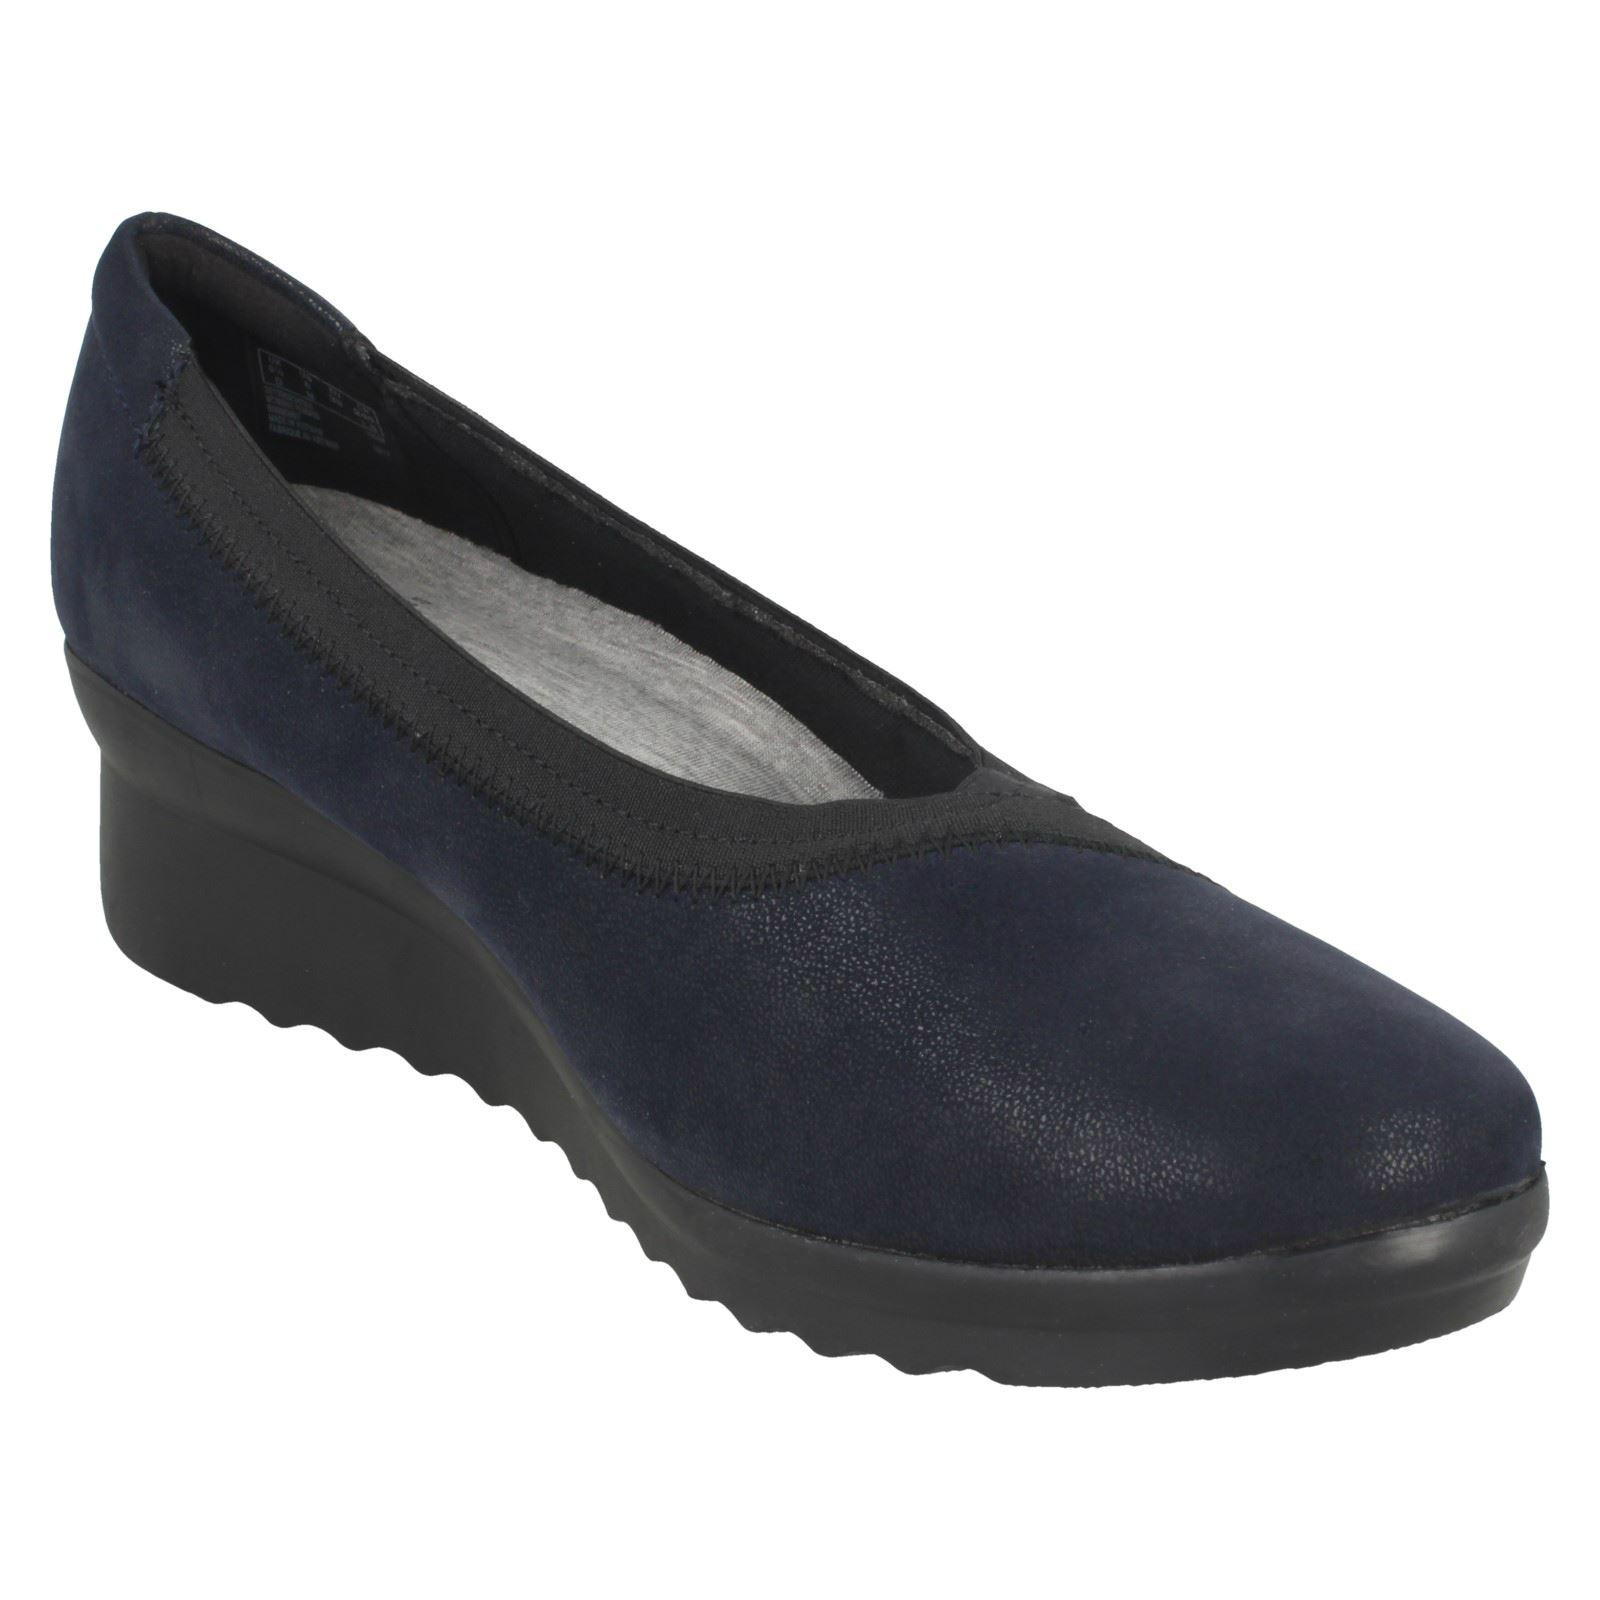 Ladies Clarks Caddell Dash Wedge Heeled Shoes